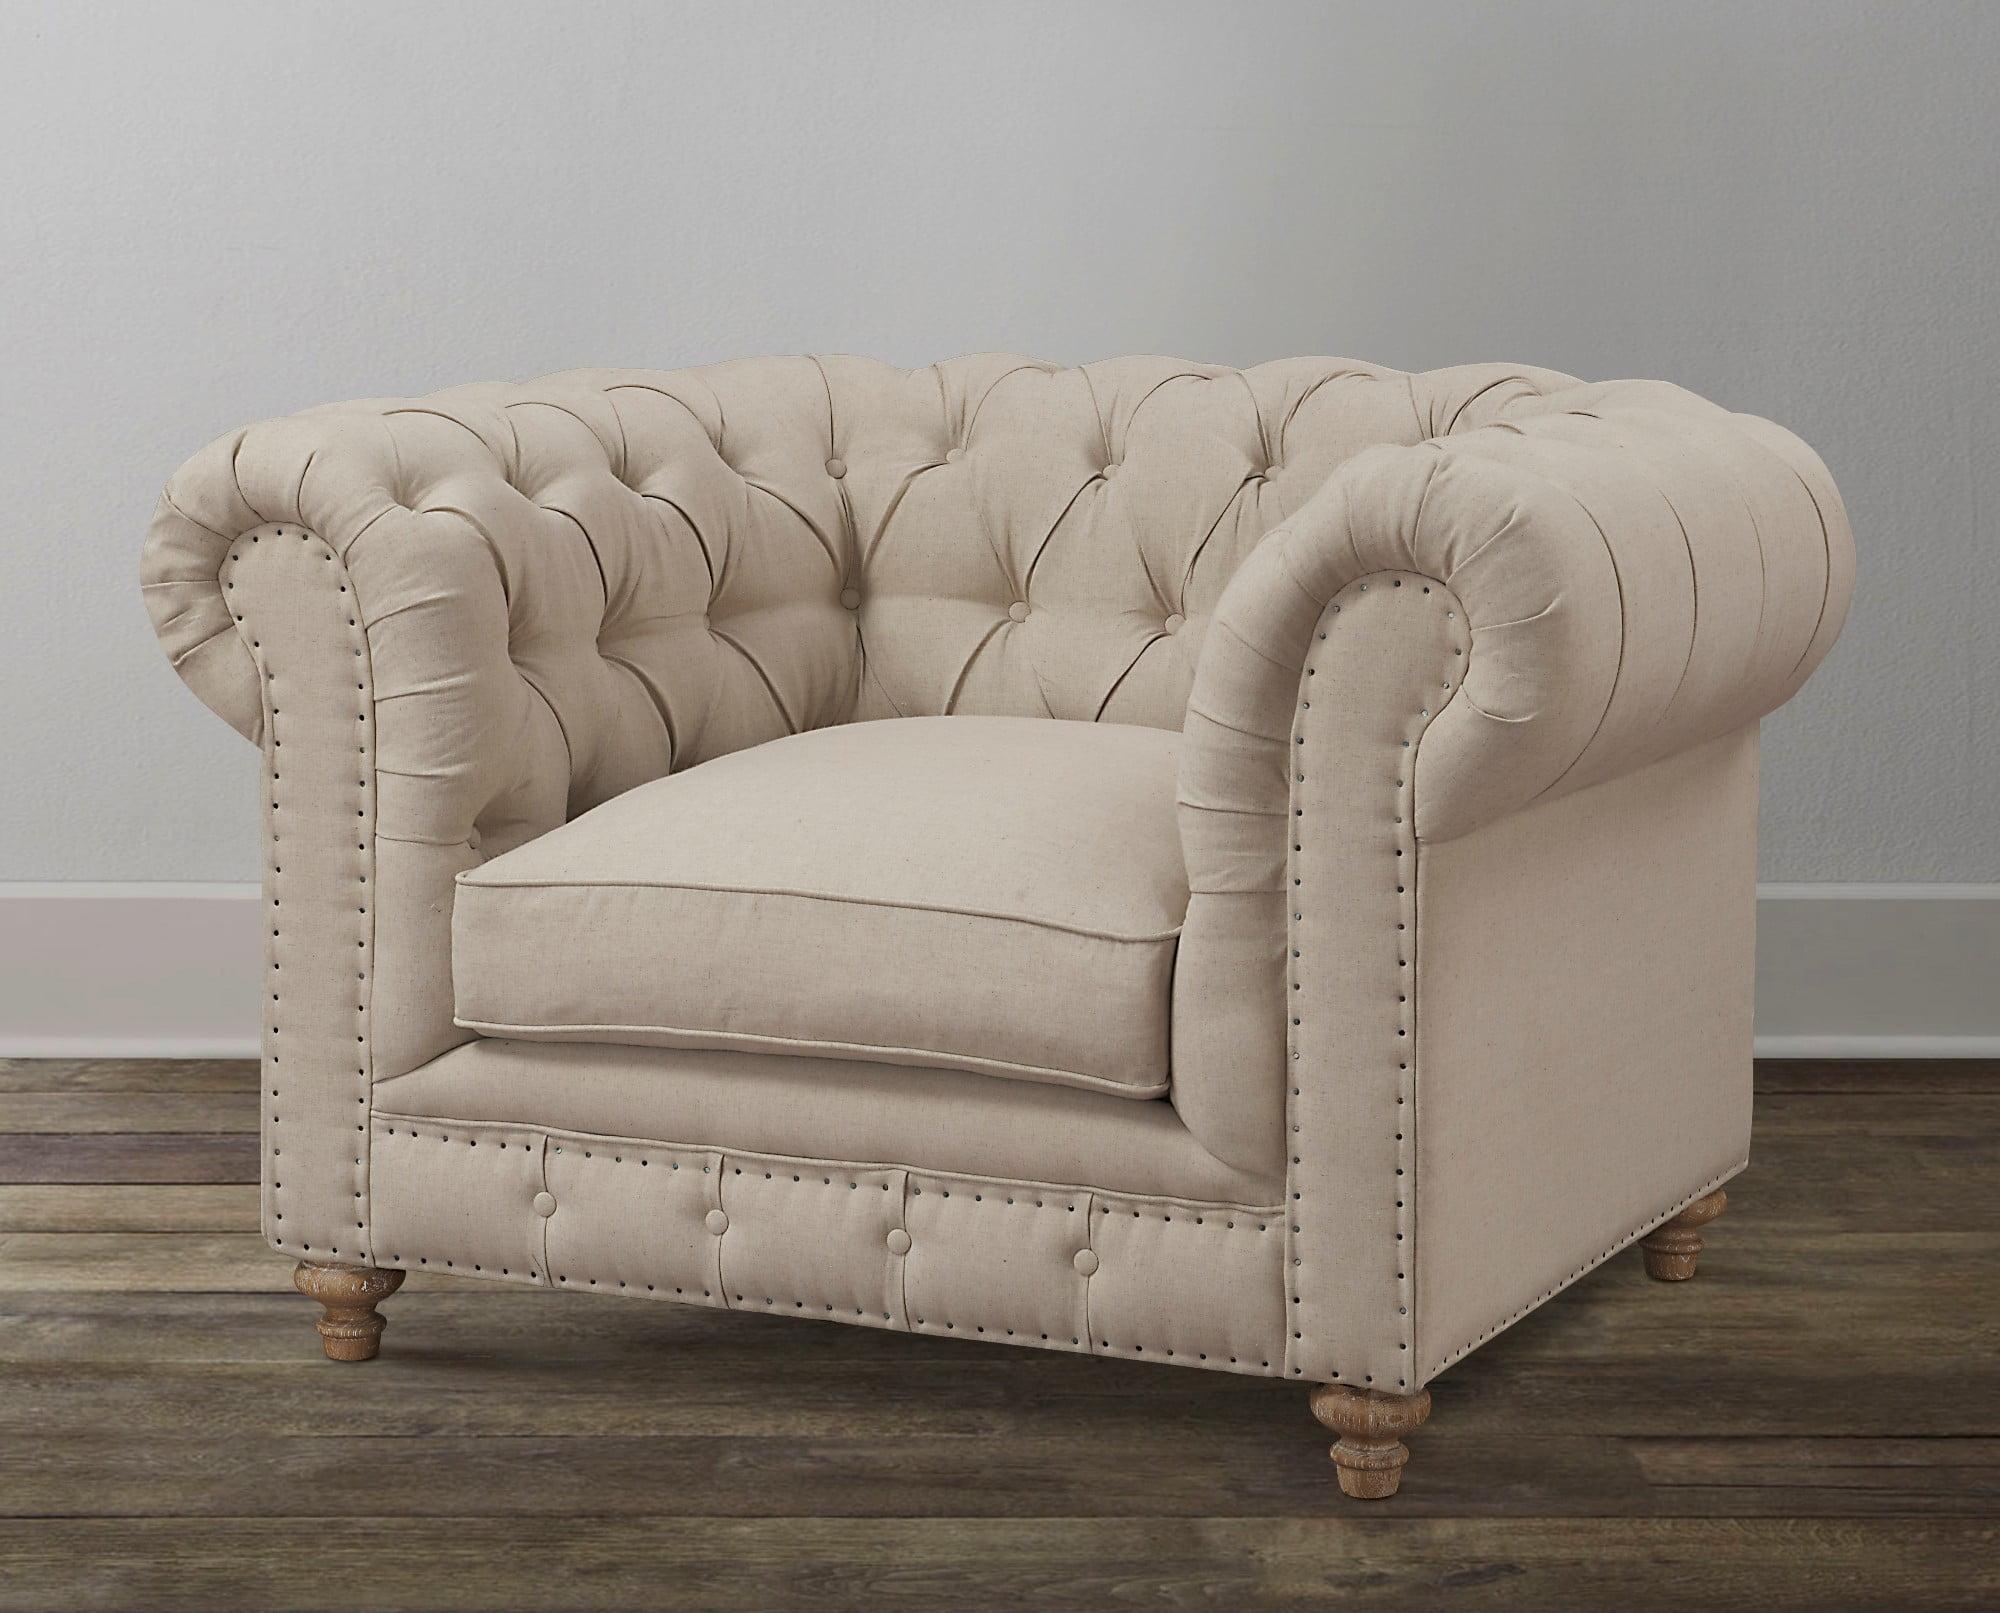 Oxford Beige Living Room Set From Tov Tov S19 C38